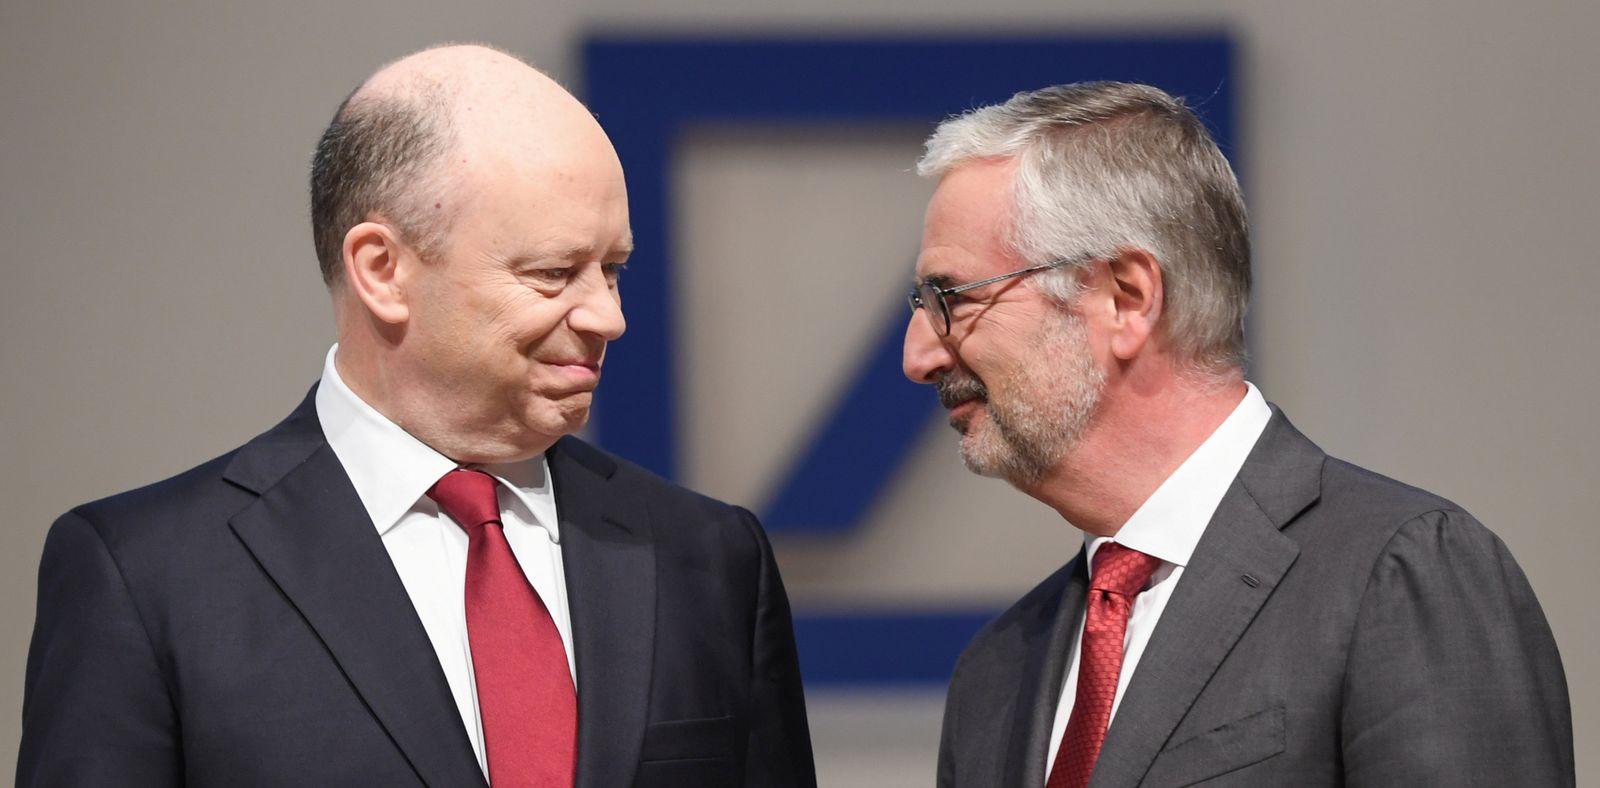 Deutsche Bank / John Cryan / Paul Achleitner